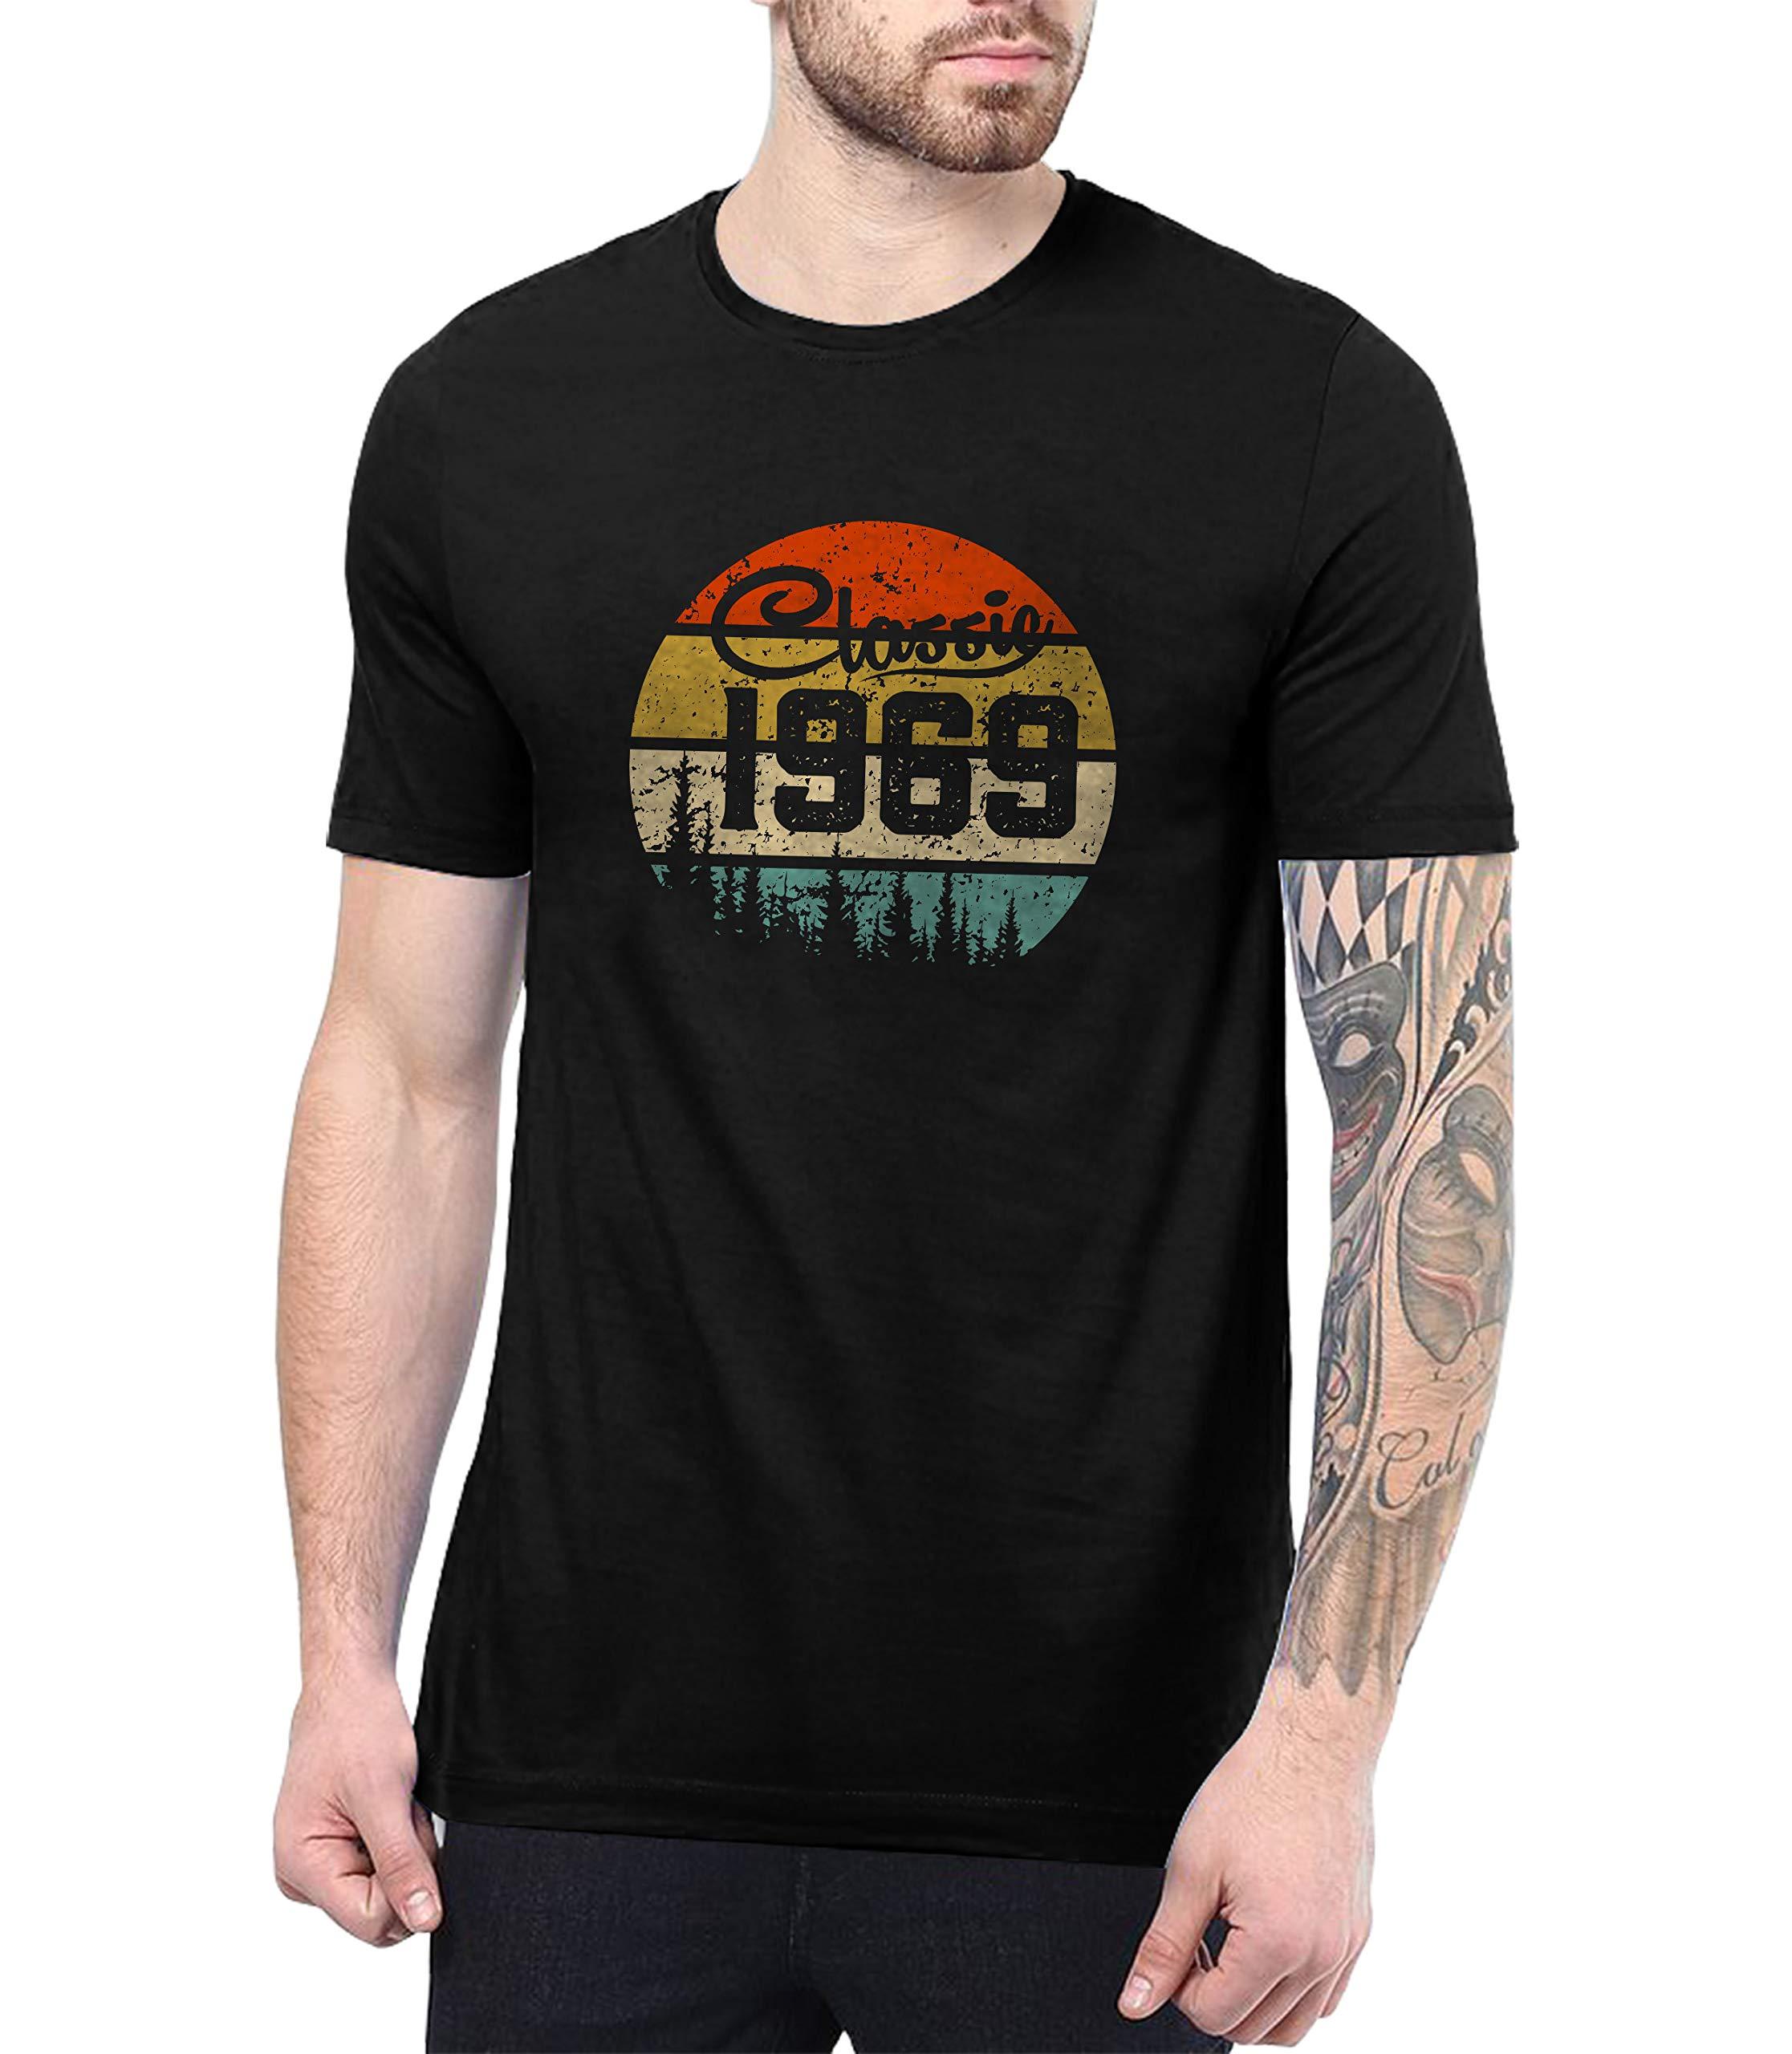 Vintage Tshirts For 80s 90s Classic Graphic Retro Shirt